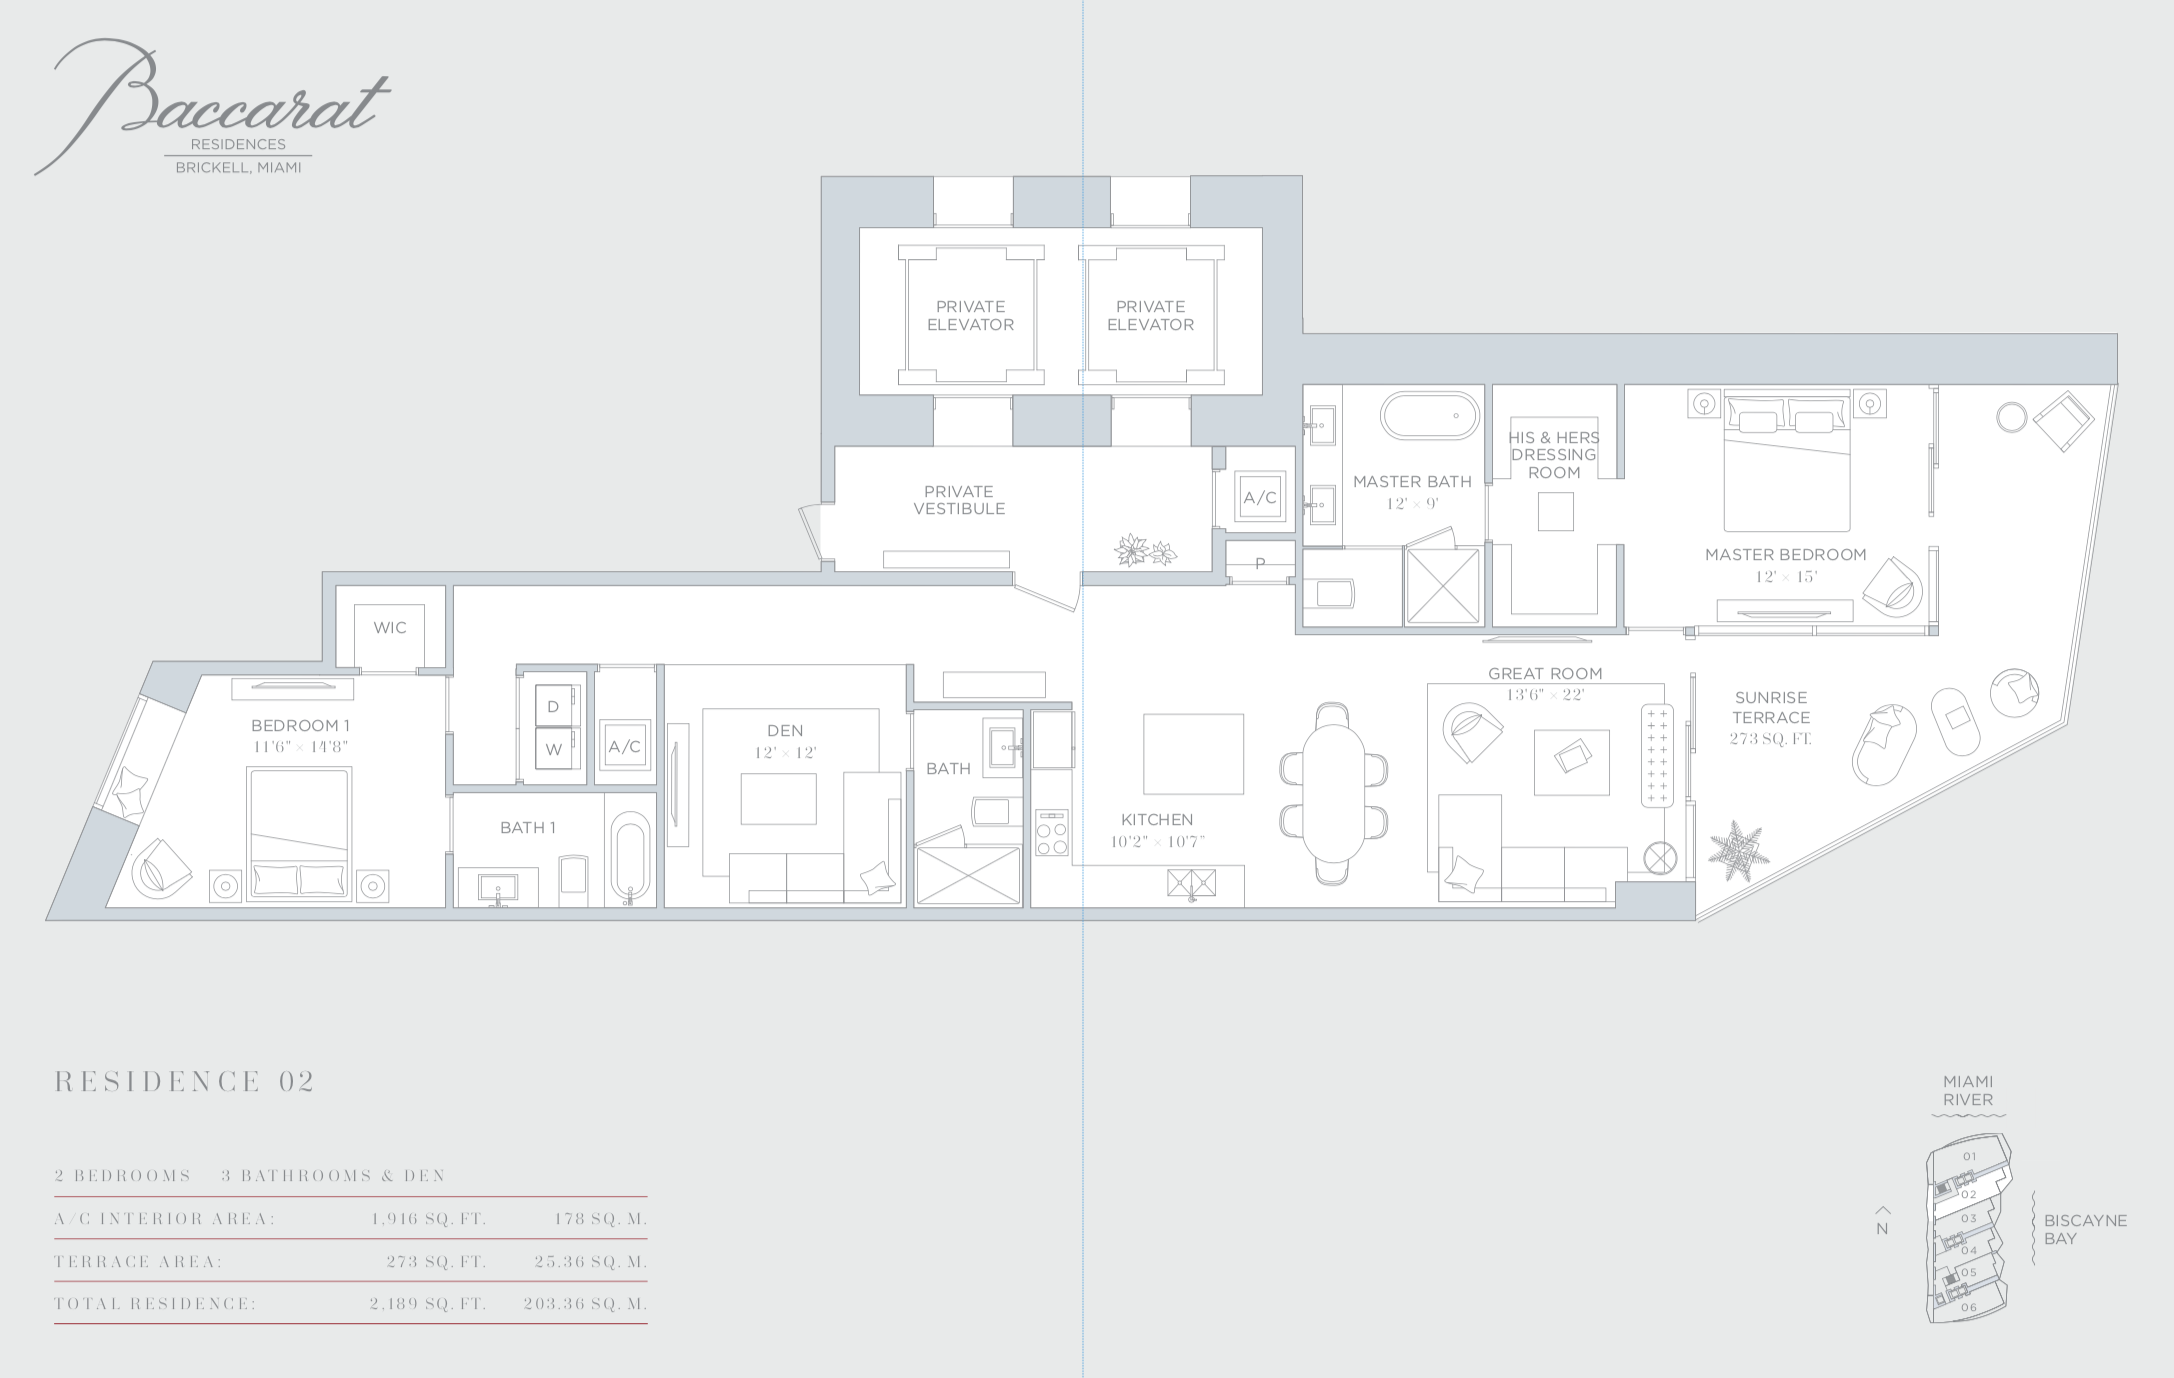 Baccarat | Residence 02 | 2 Bedrooms + Den | 1,916 SF